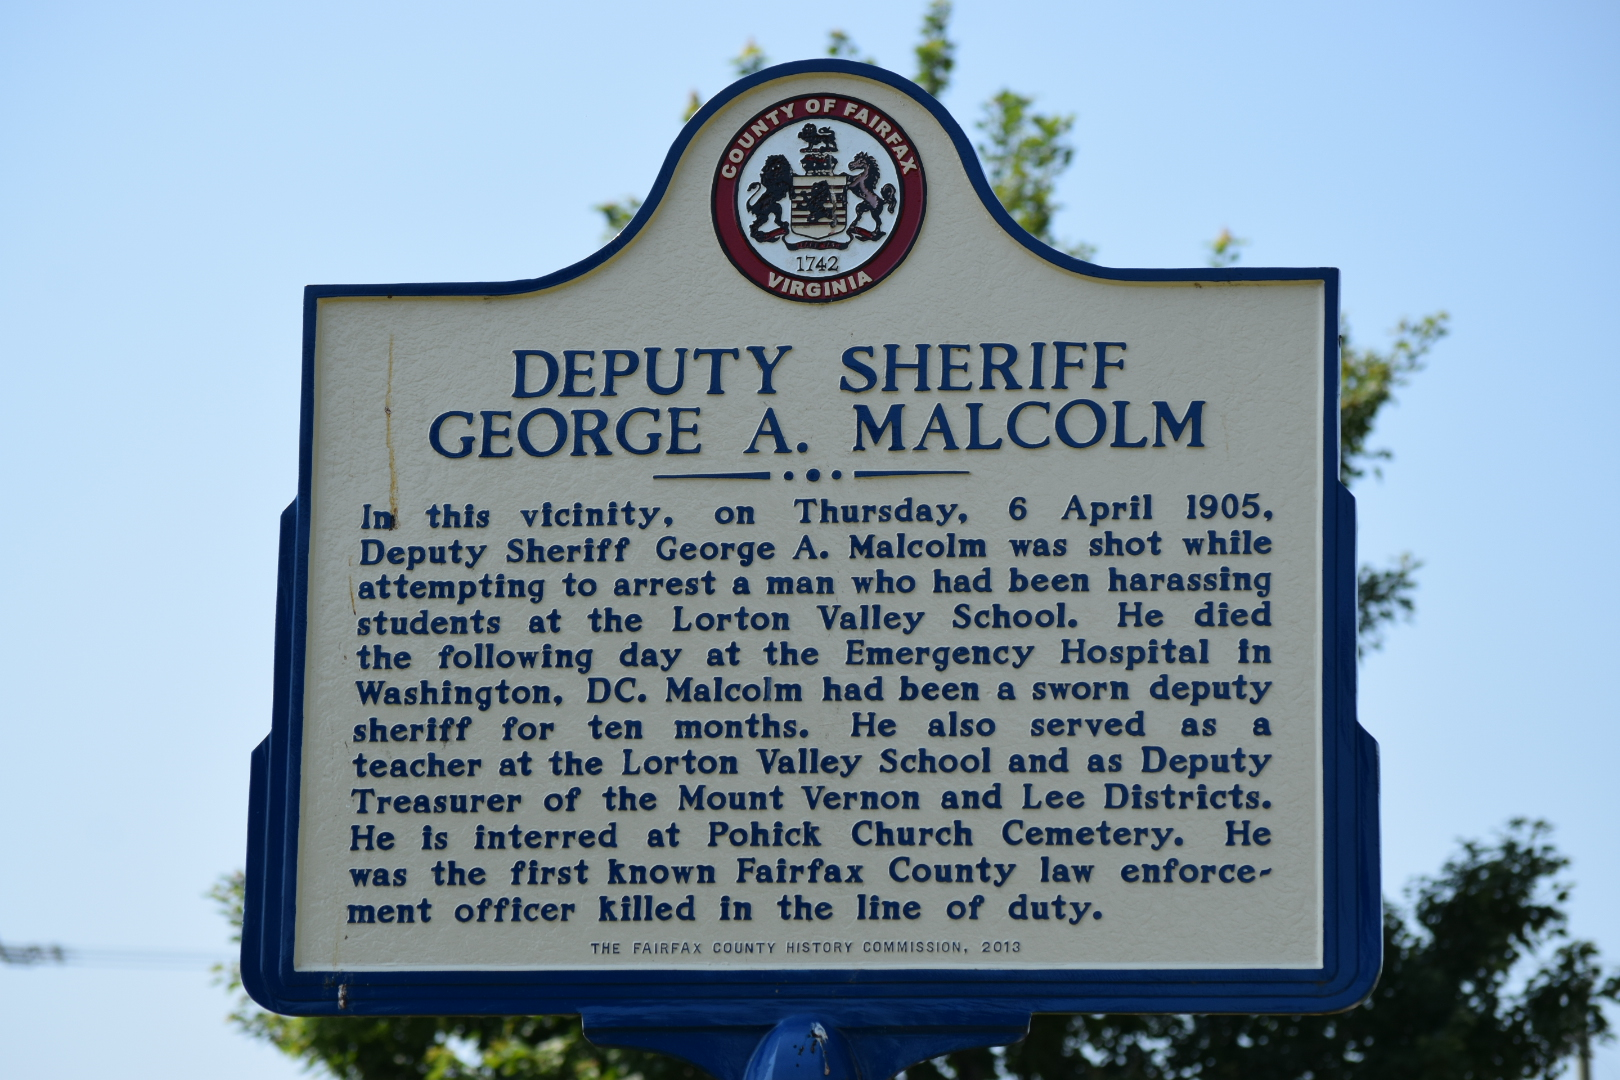 Deputy Sheriff George A. Malcolm | Fairfax County Sheriff's Office, Virginia